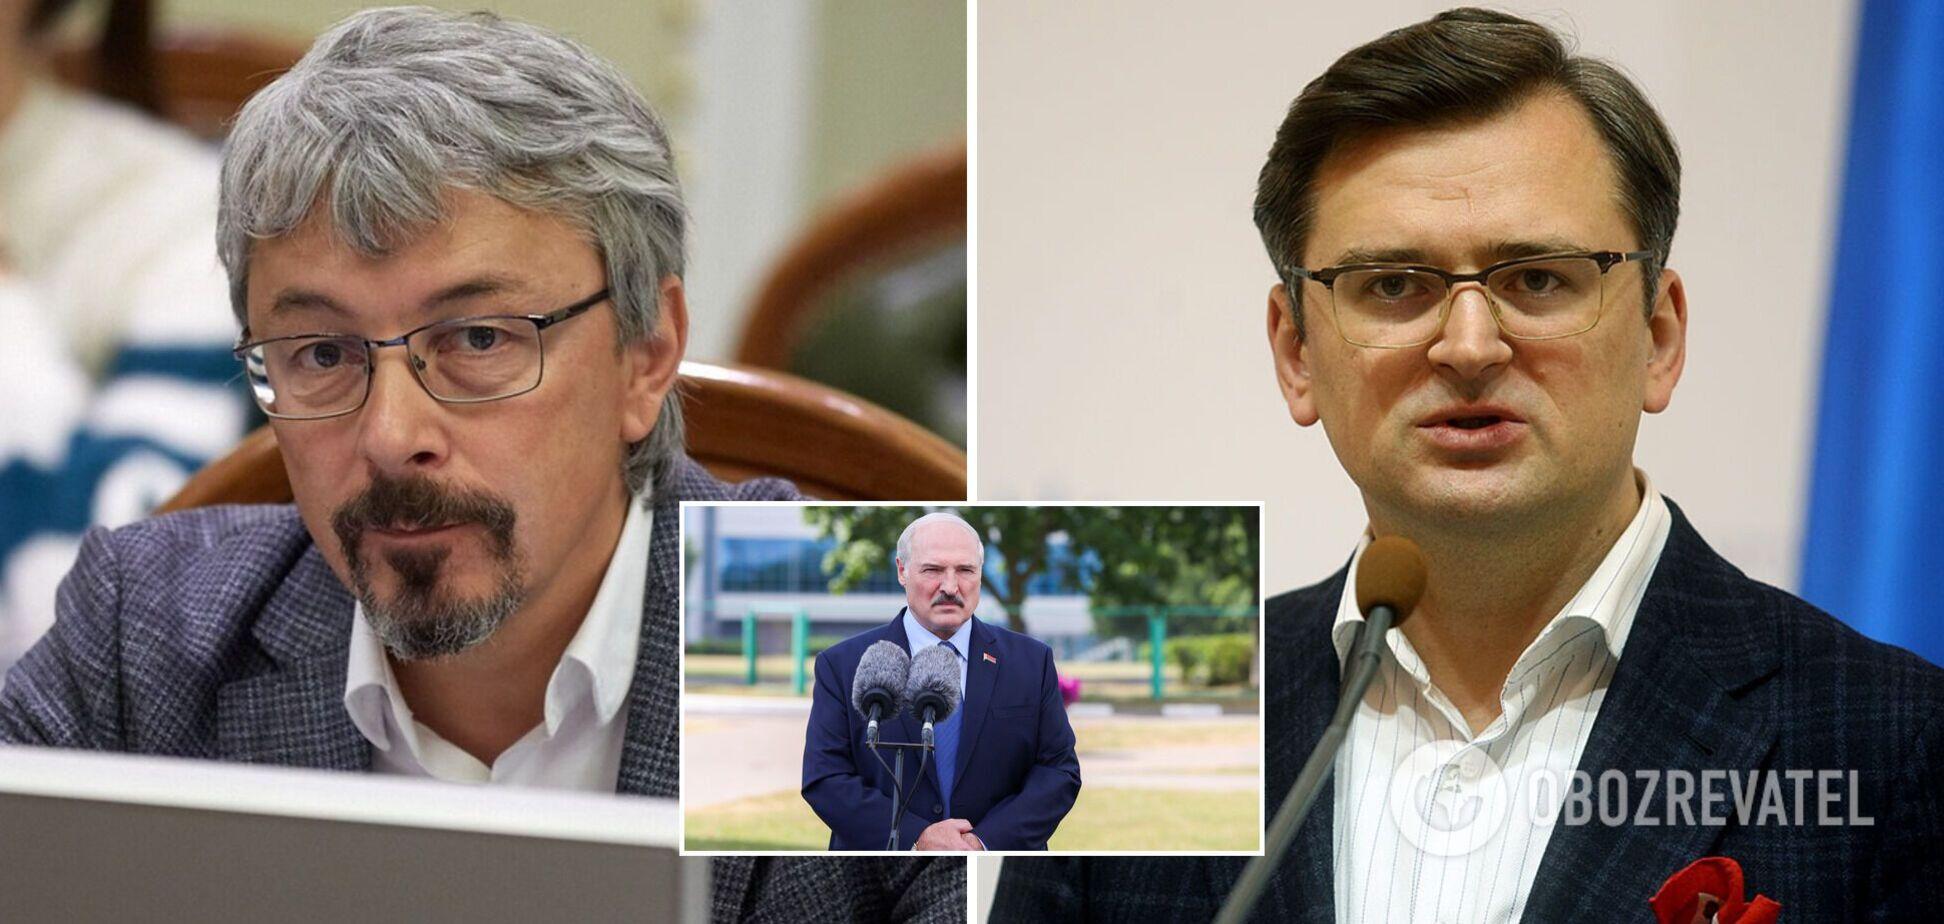 Глава Минкульта Украины Александр Ткаченко, глава МИД Дмитрий Кулеба и нелегитимный президент Беларуси Александр Лукашенко